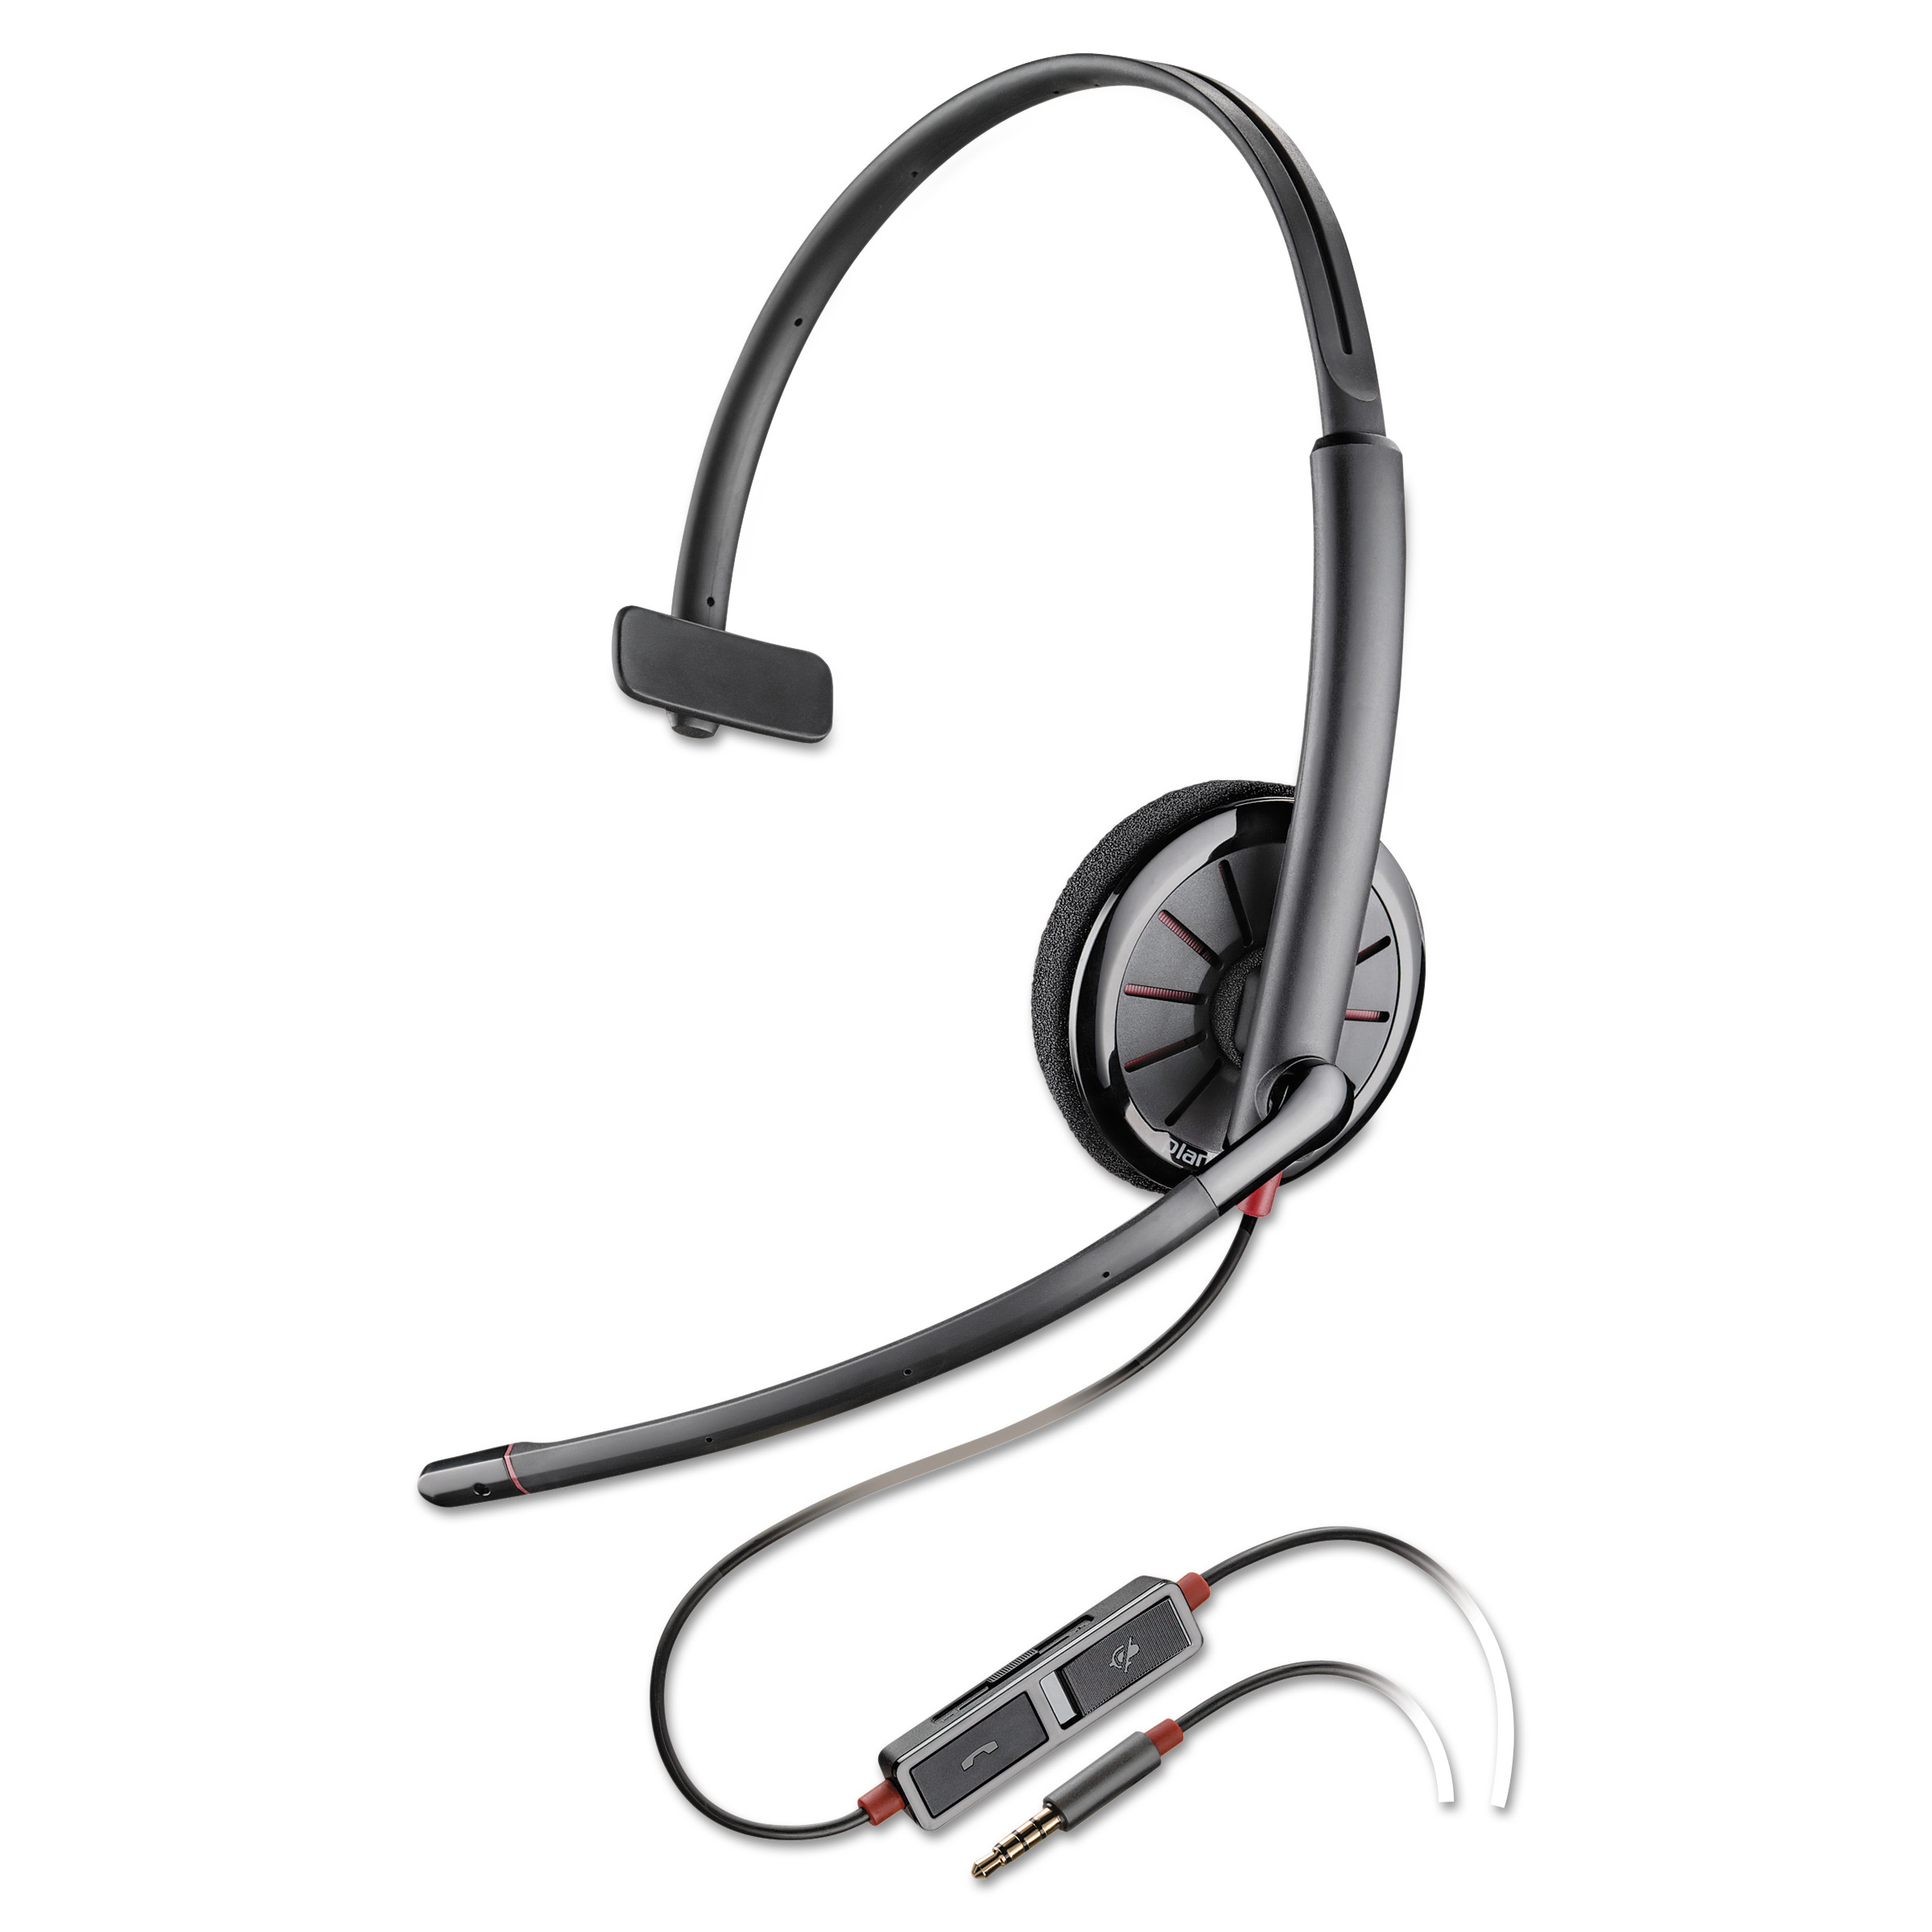 Plantronics Blackwire C215 Monaural Over-the-Head Headset